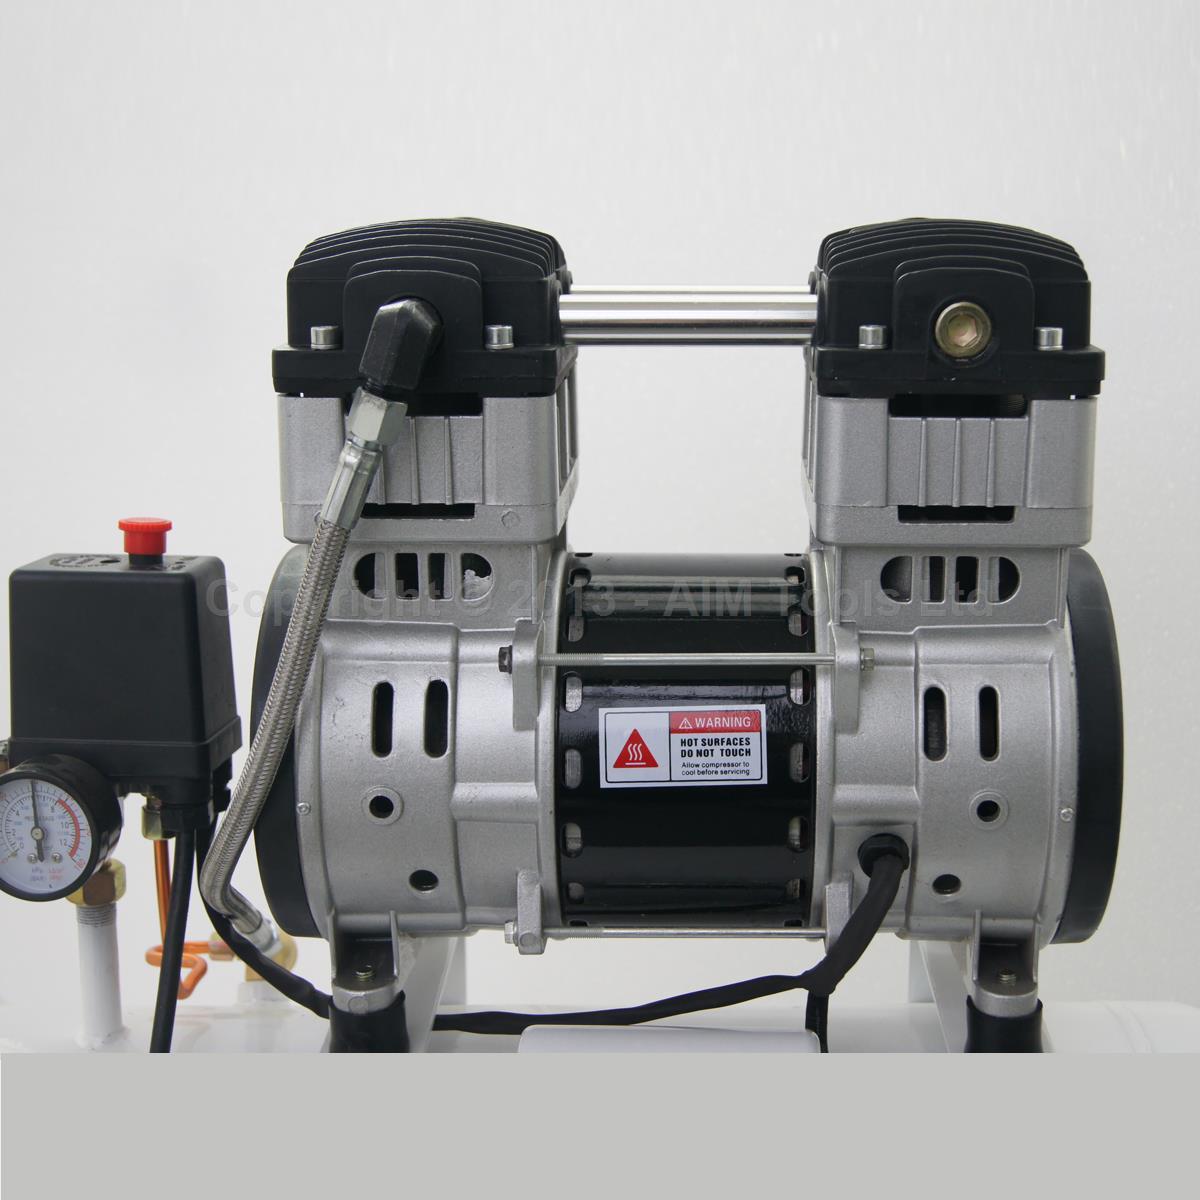 241185 Silent Type Air Compressor 65db 220v 1100w 50l For